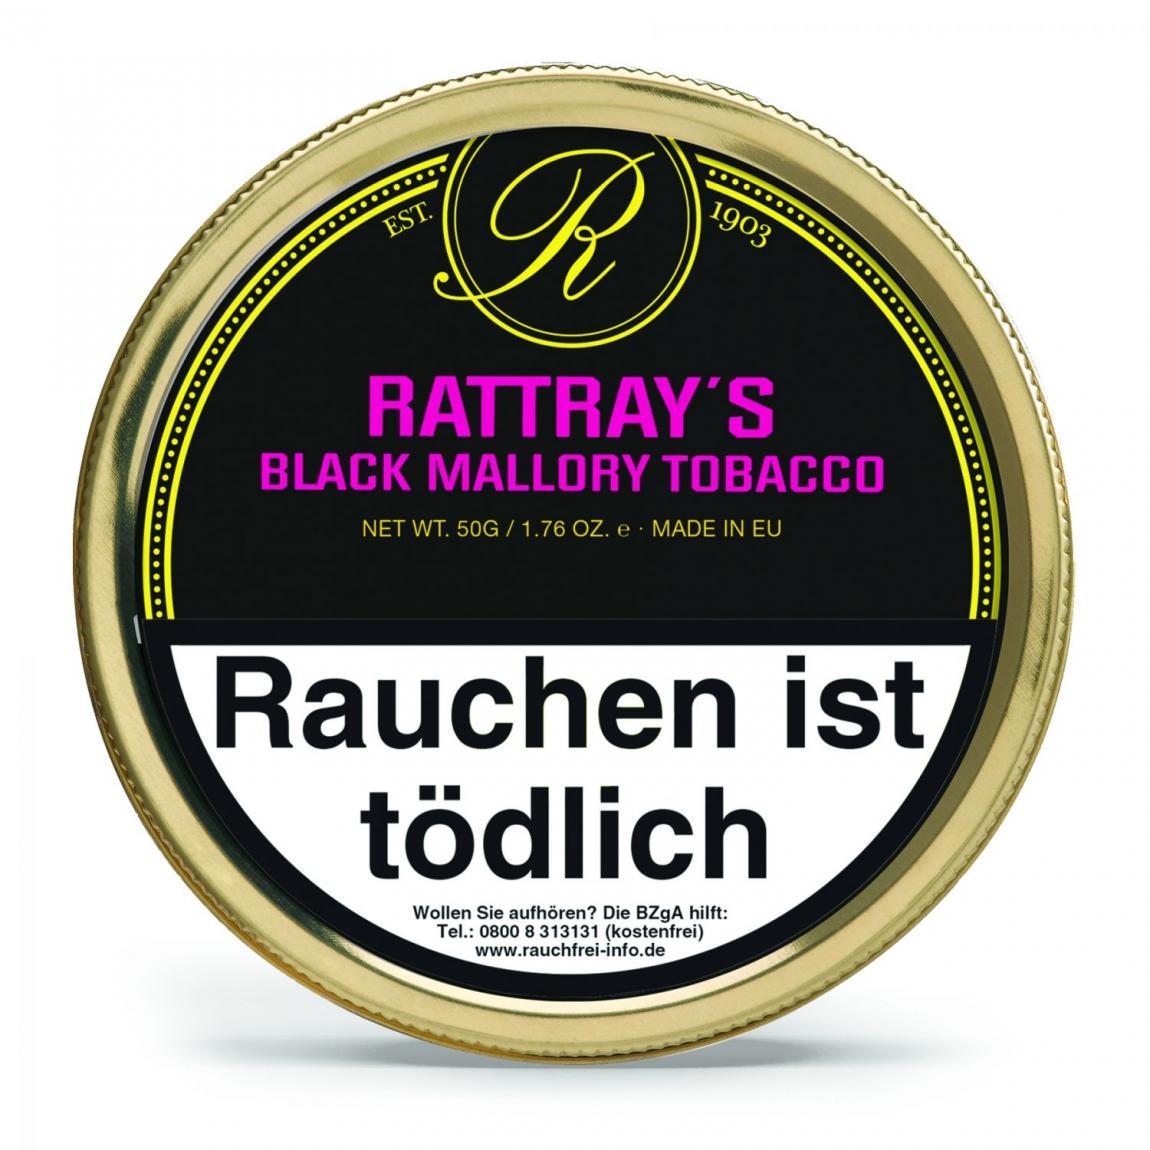 Rattray's Black Mallory 50g Dose